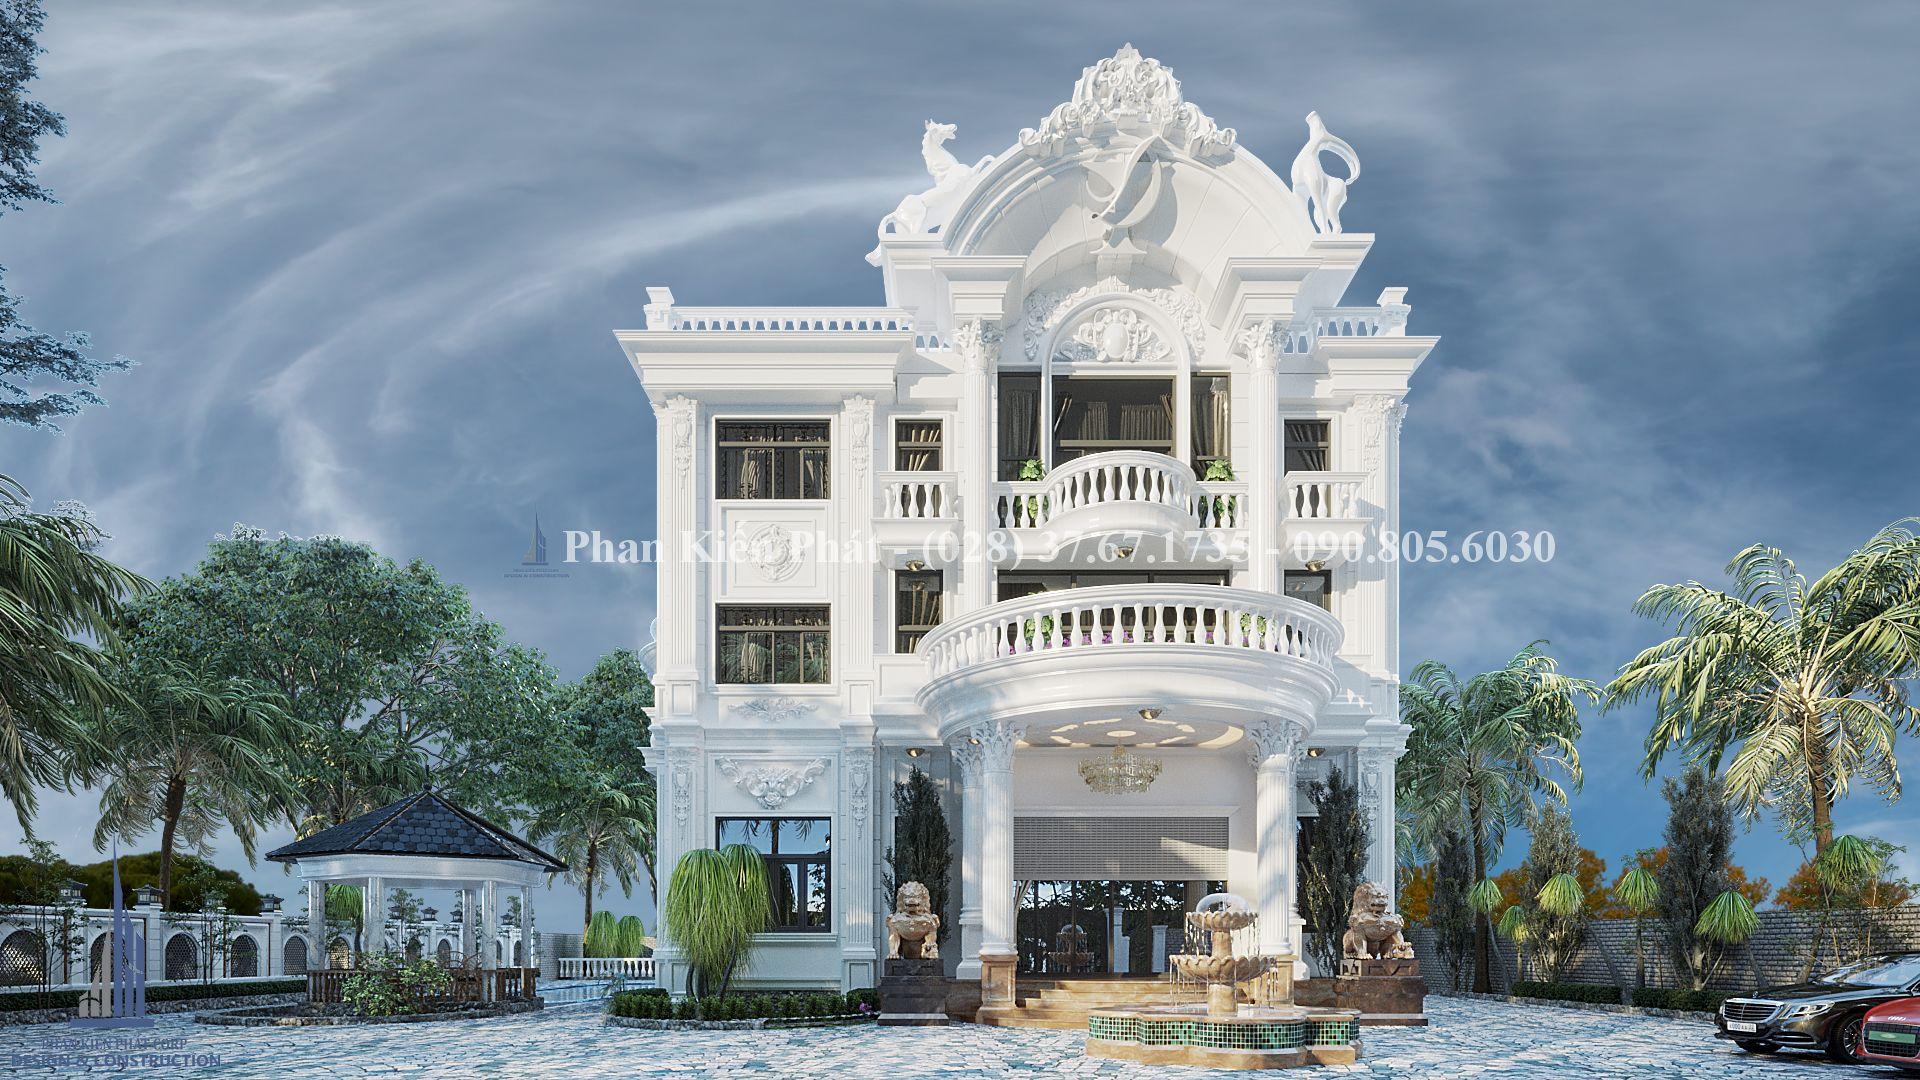 Biet Thu Co Dien Dep Anh Dung 1